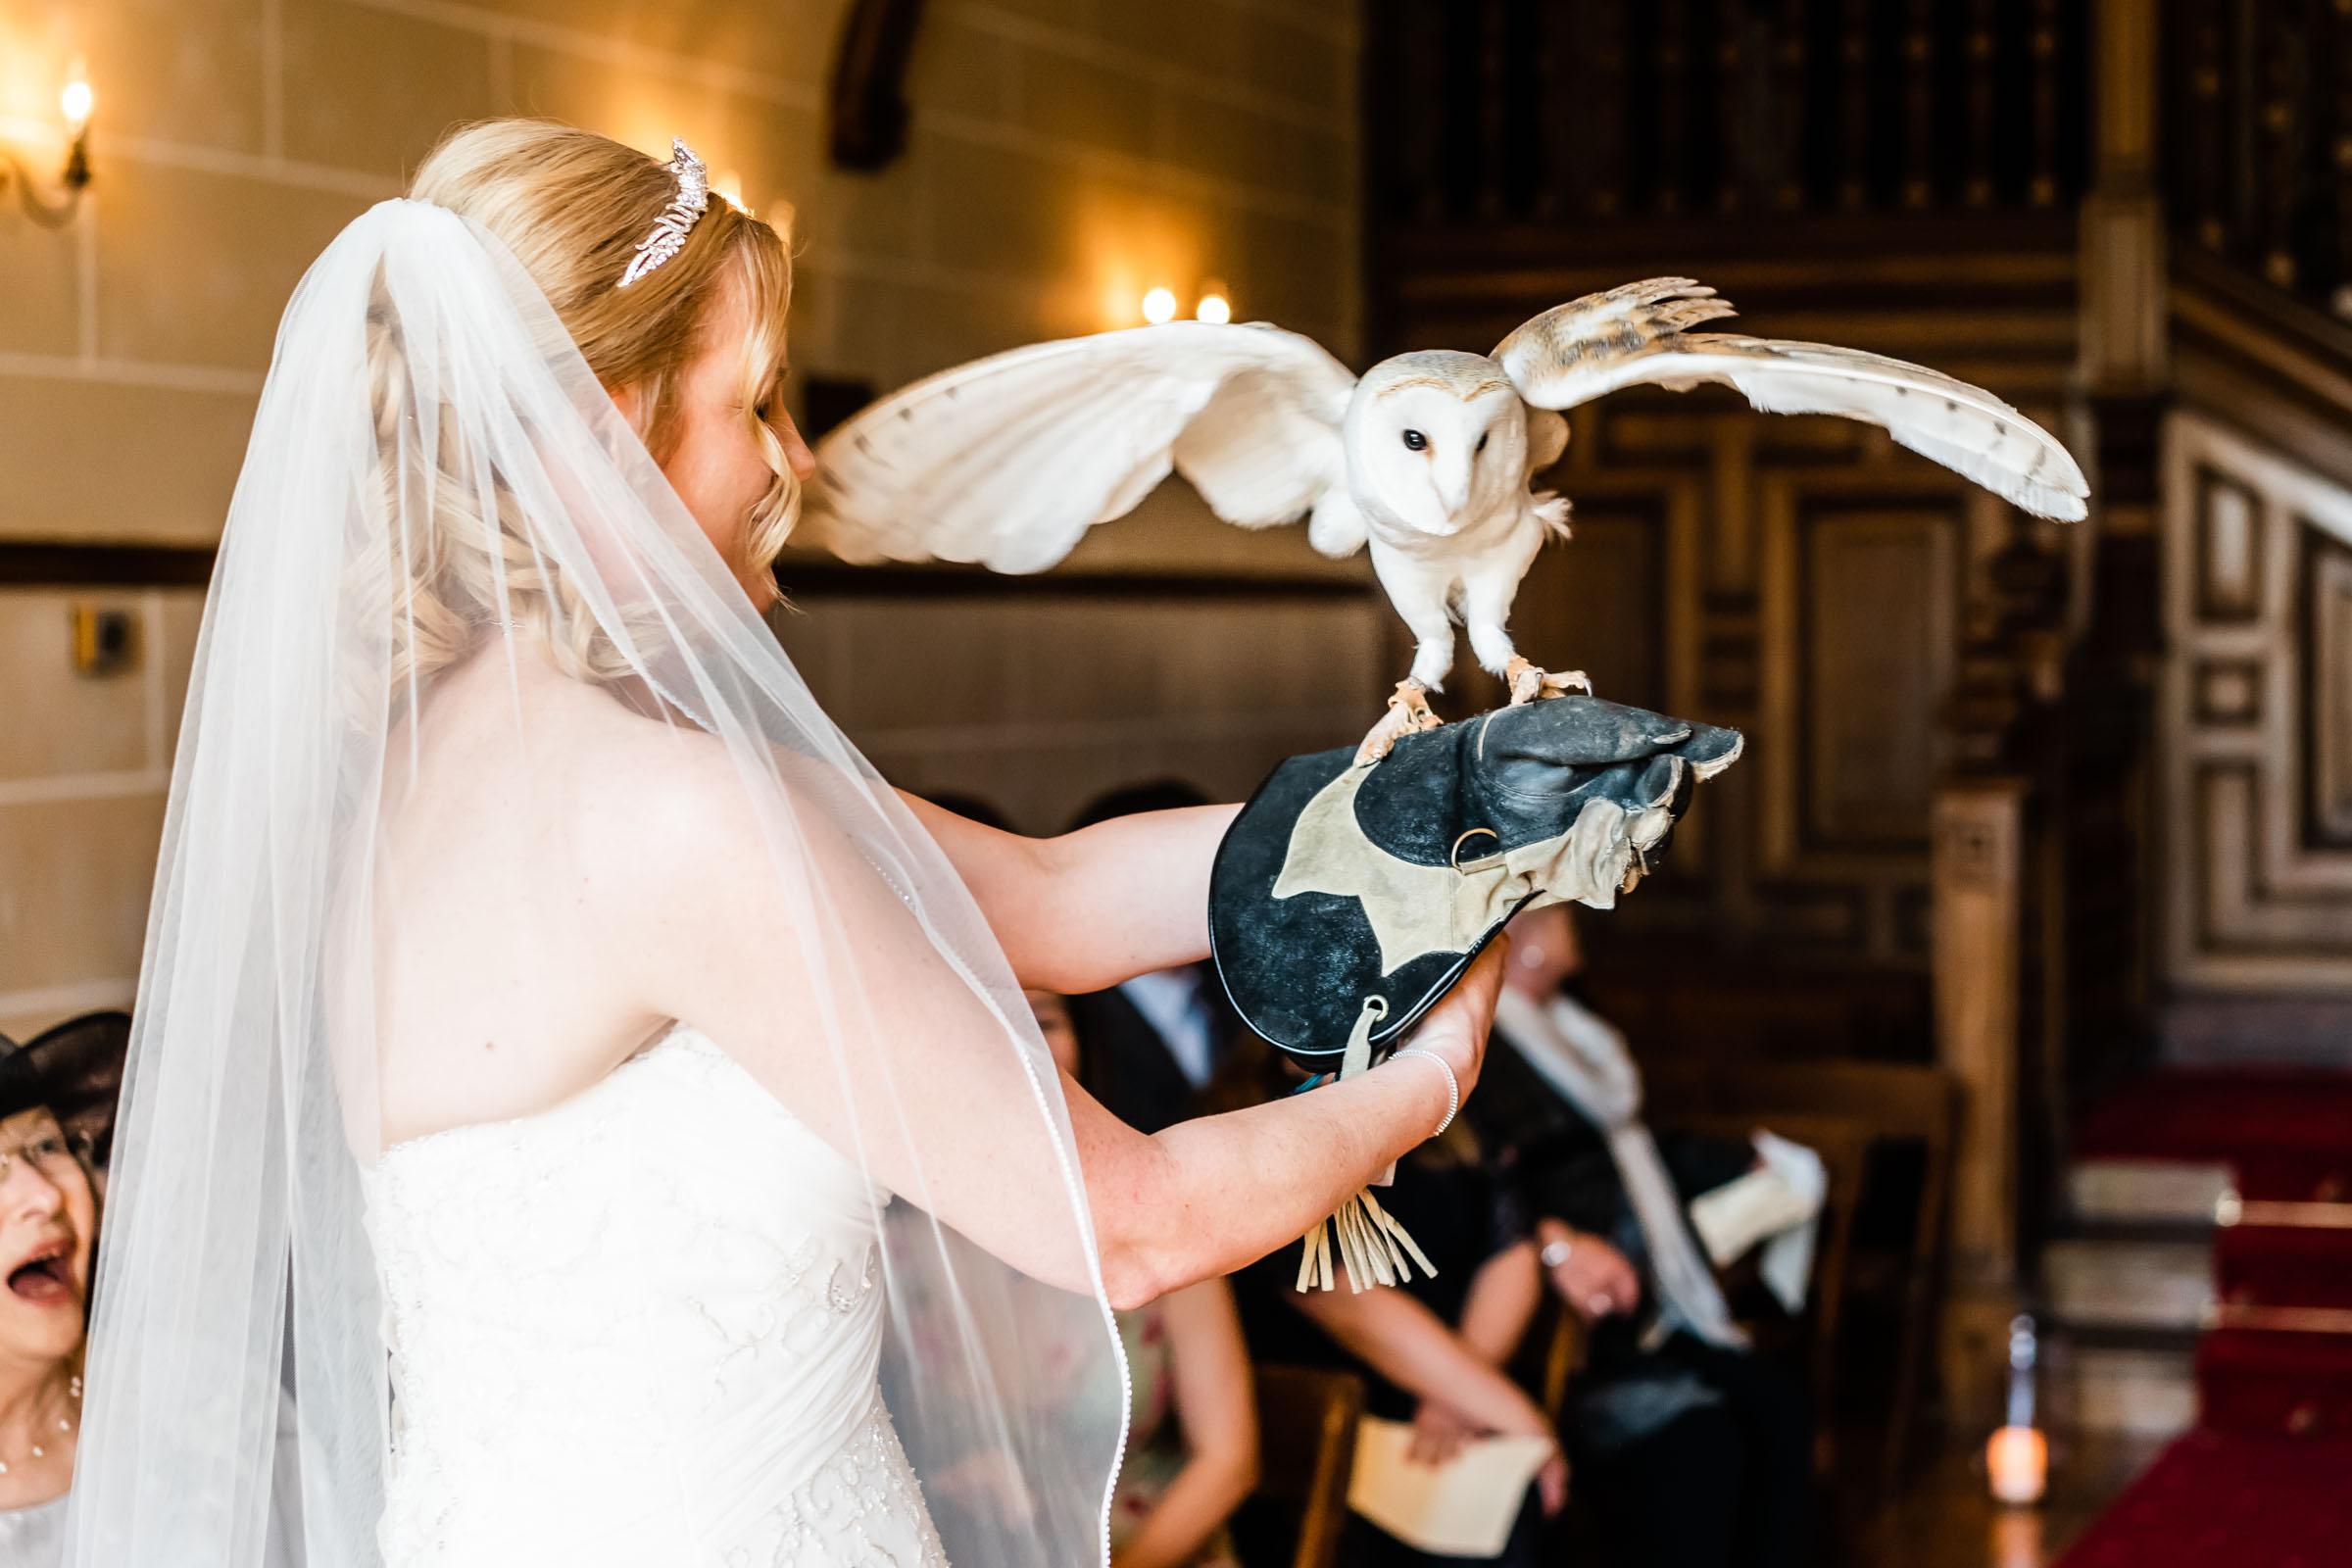 dalhousie-midlothian-wedding-dearlyphotography (3 of 10).jpg